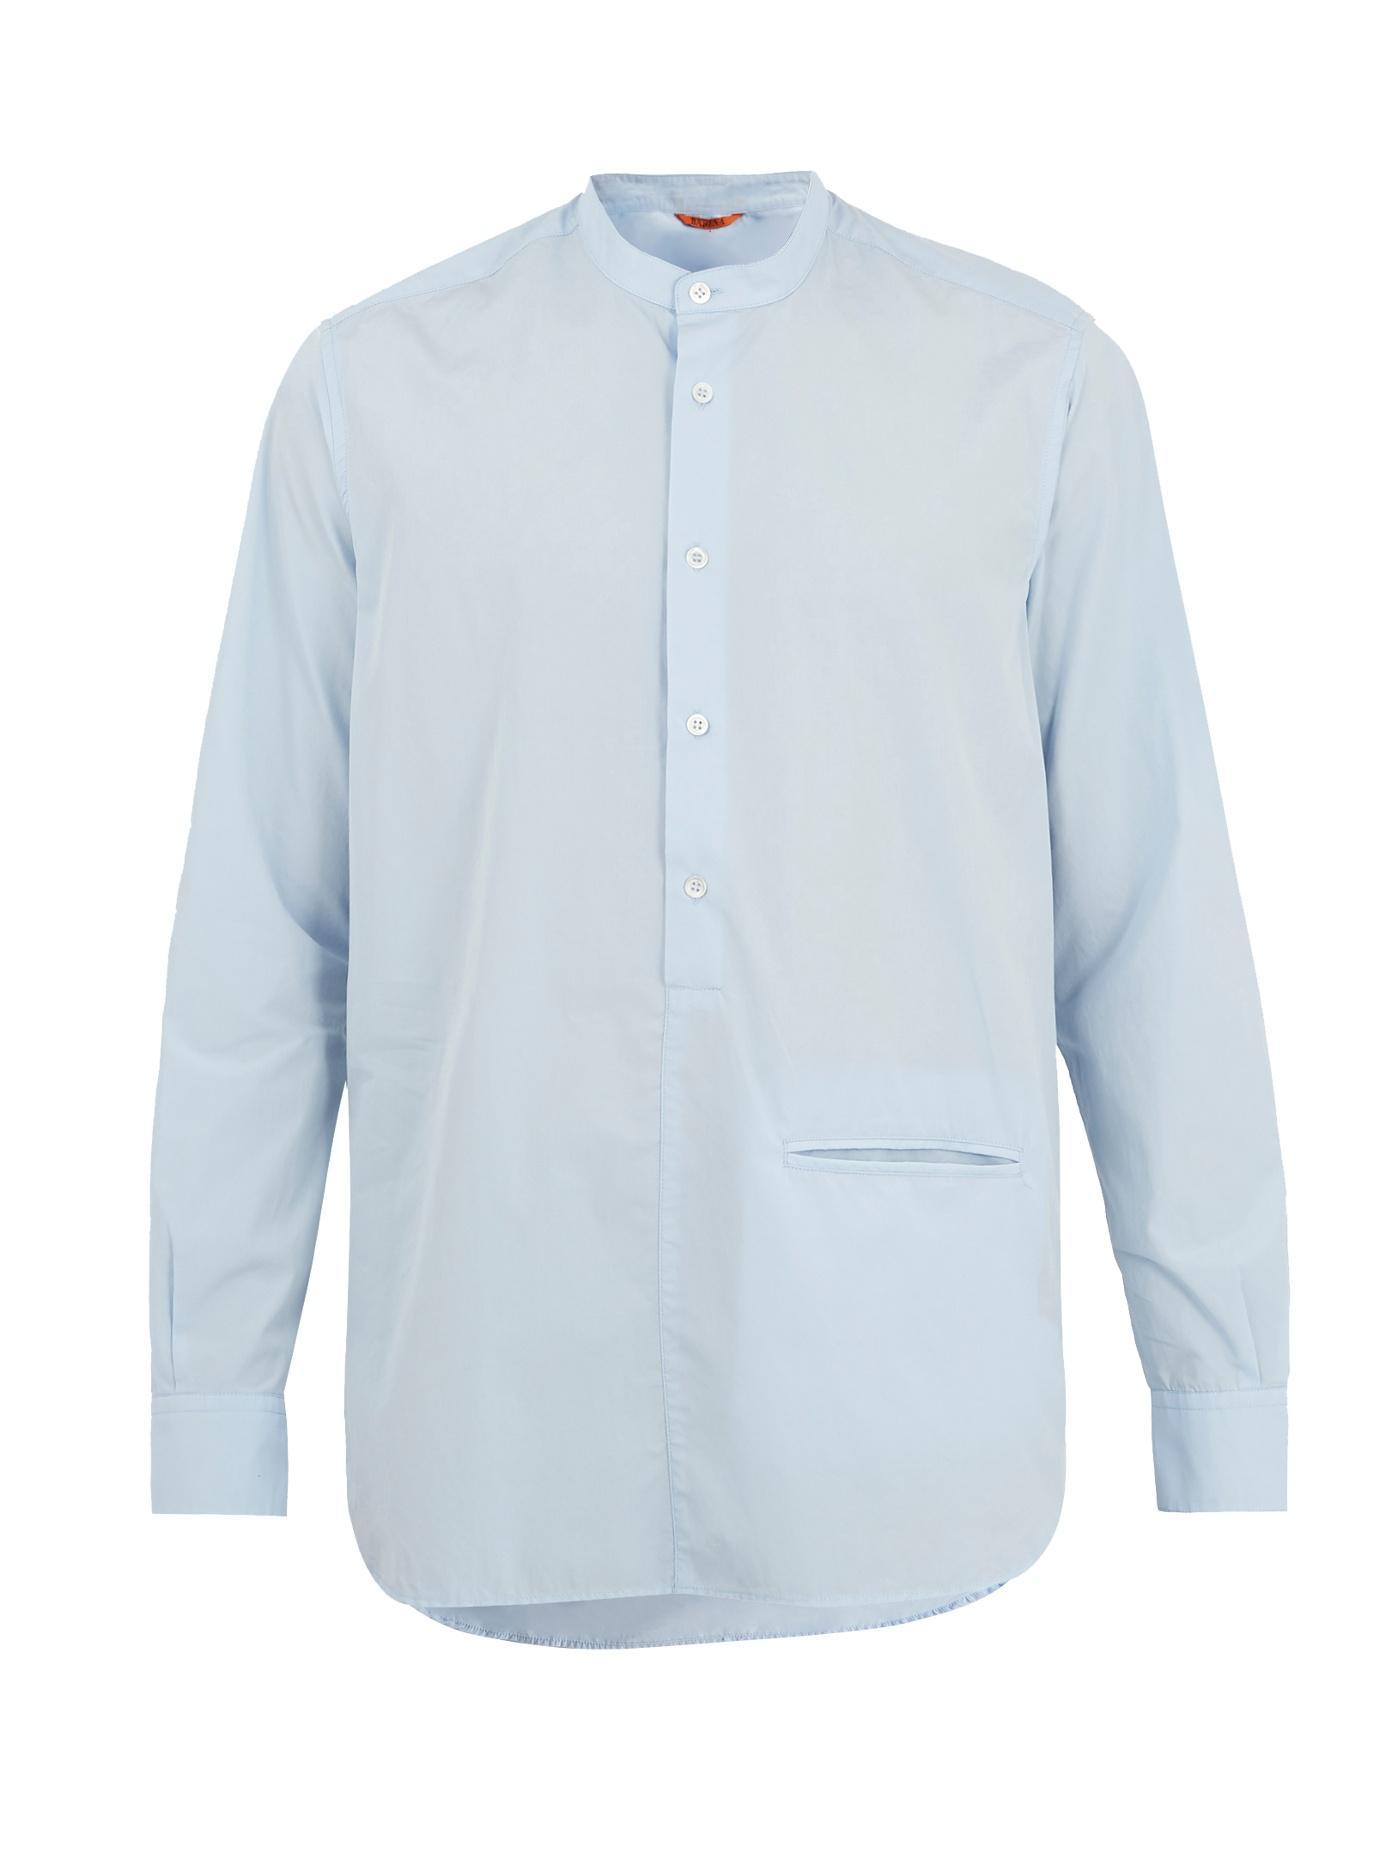 Barena Venezia Stand-Collar Single-Cuff Cotton-Poplin Shirt In Light Blue